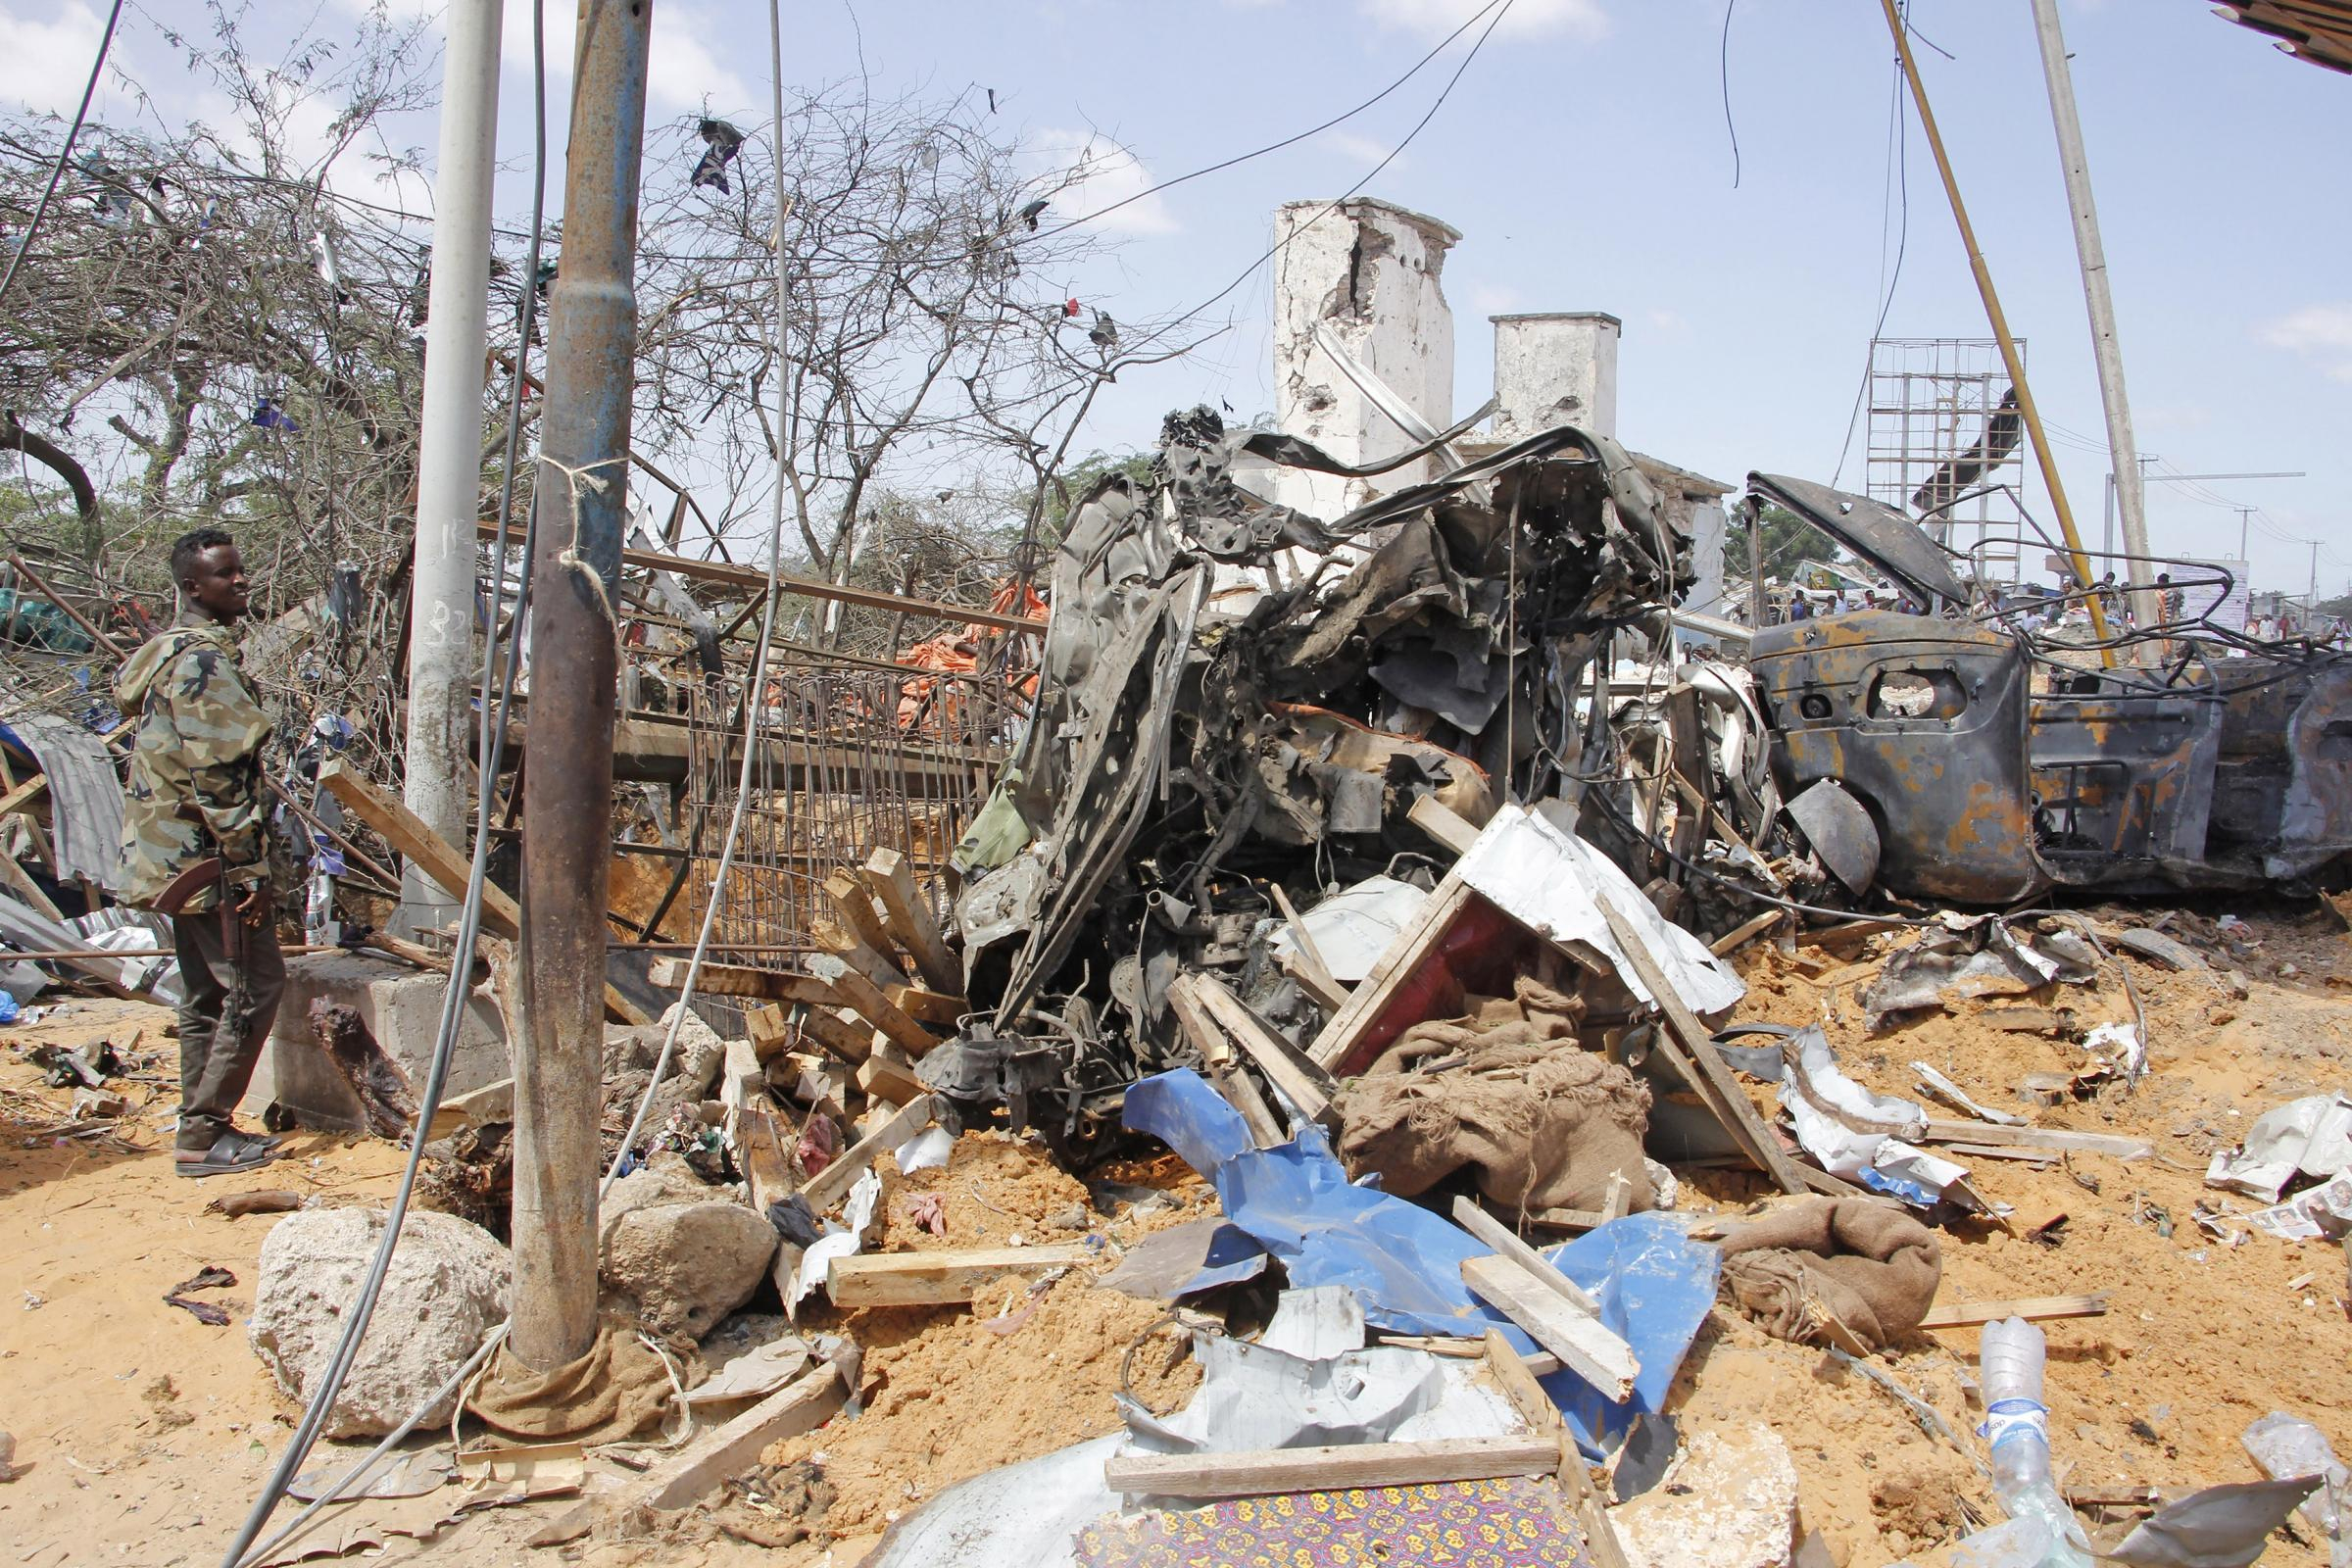 Mogadishu truck bomb attack leaves more than 70 dead